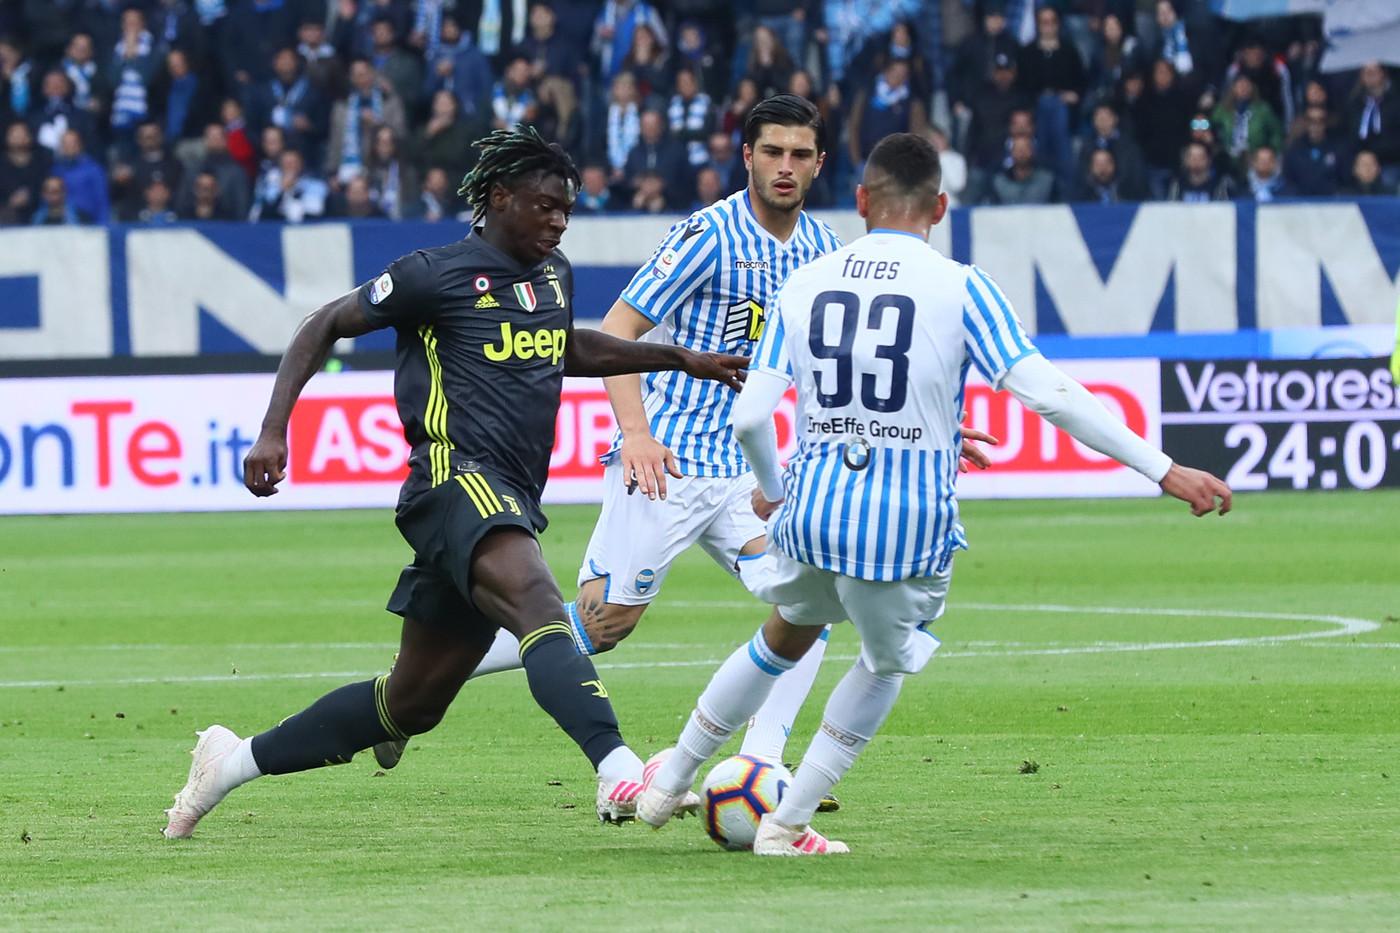 Serie A, Spal-Juventus 2-1   Il fotoracconto